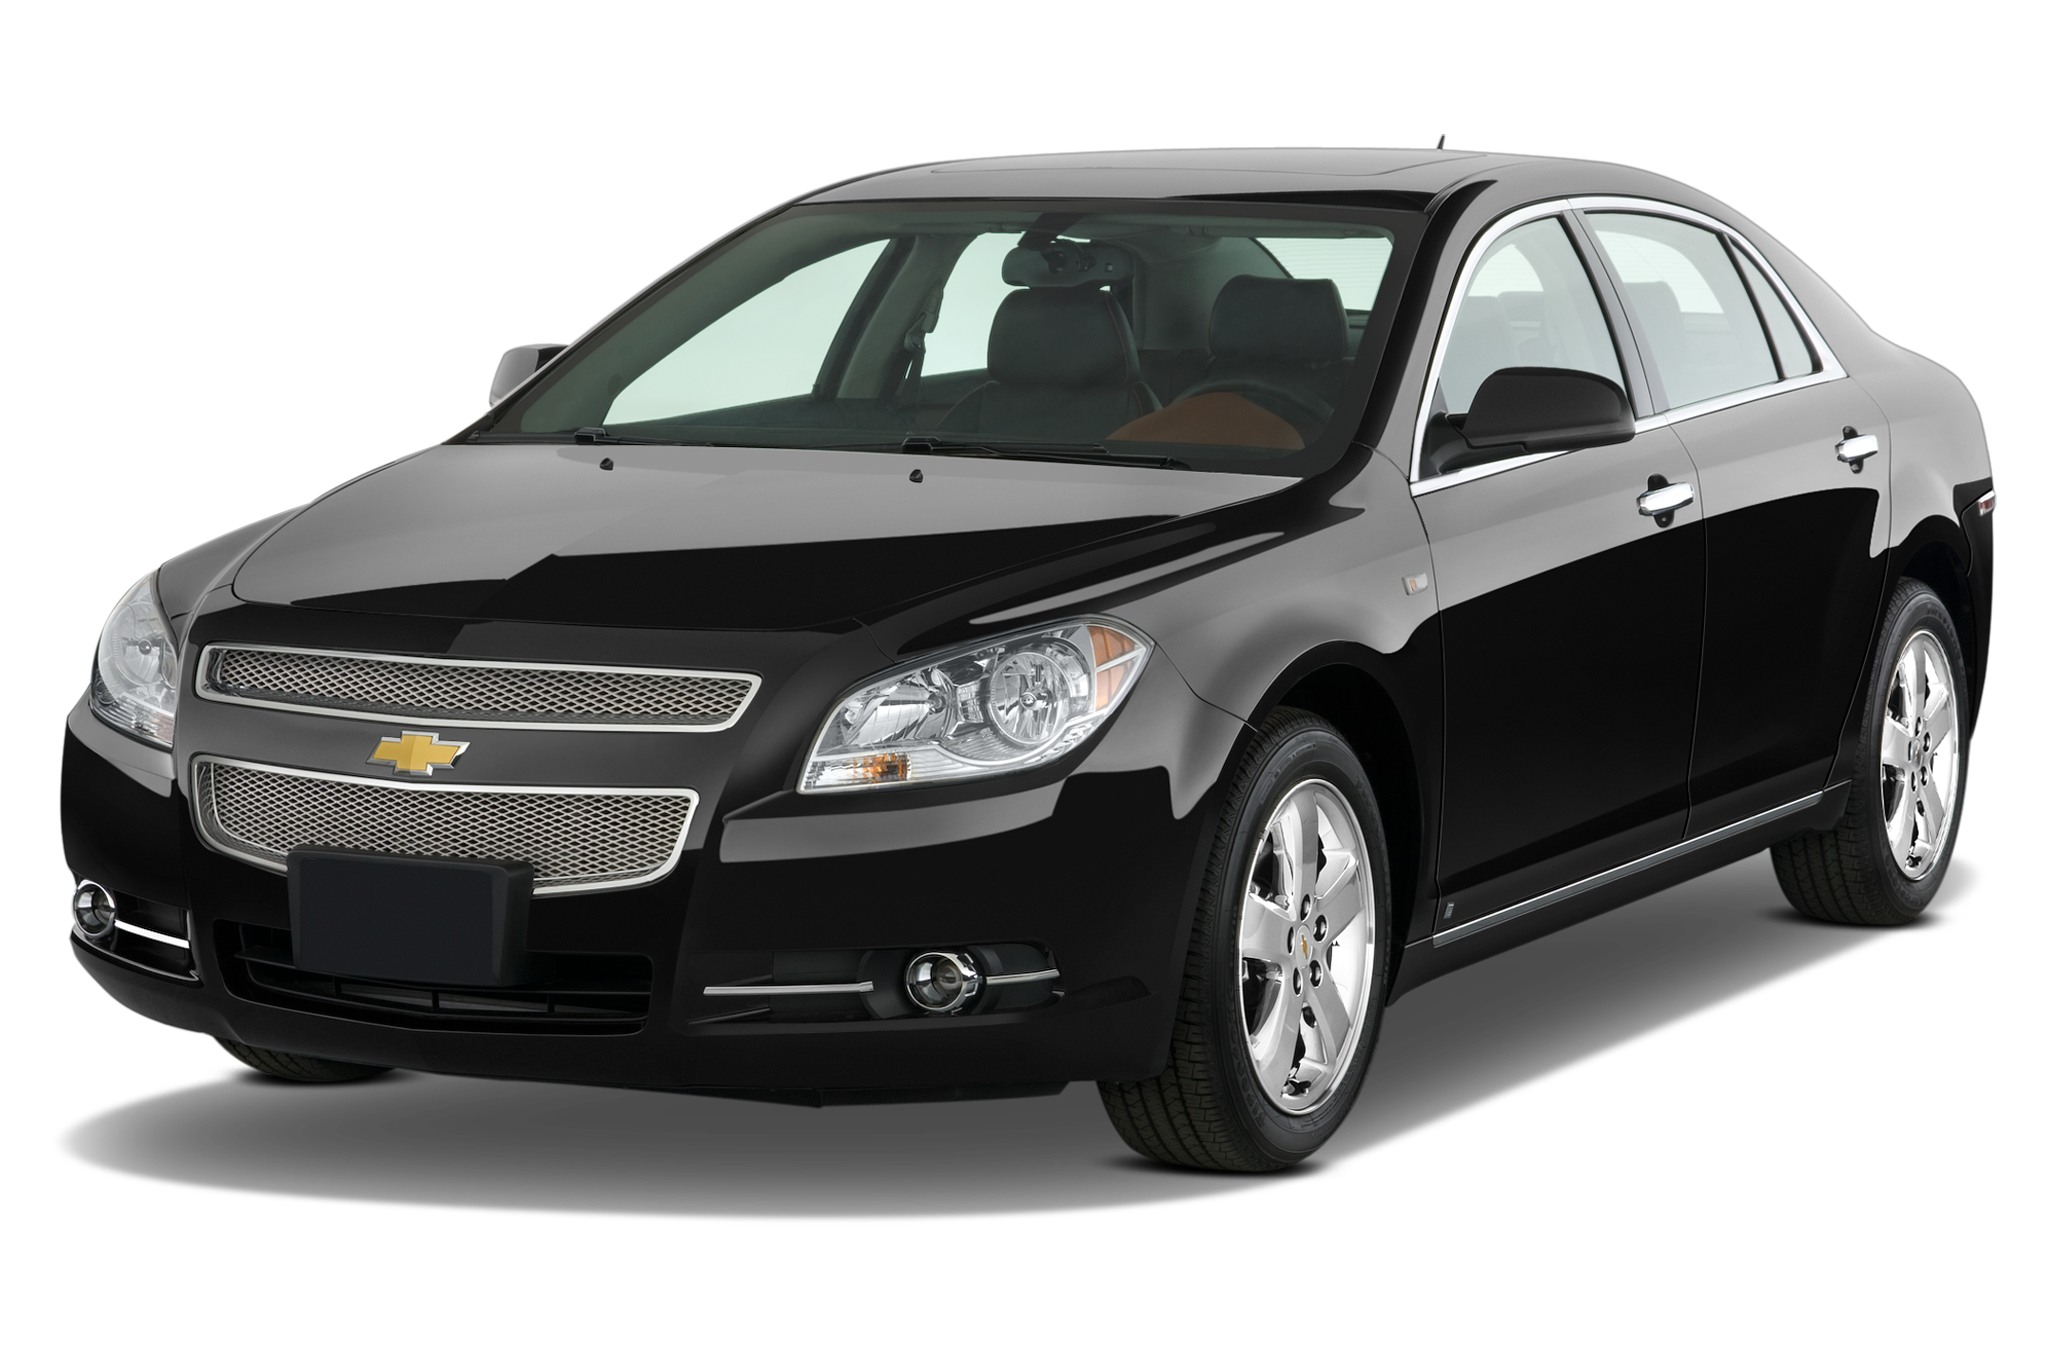 2010 Chevrolet Malibu Ltz Automobile Magazine